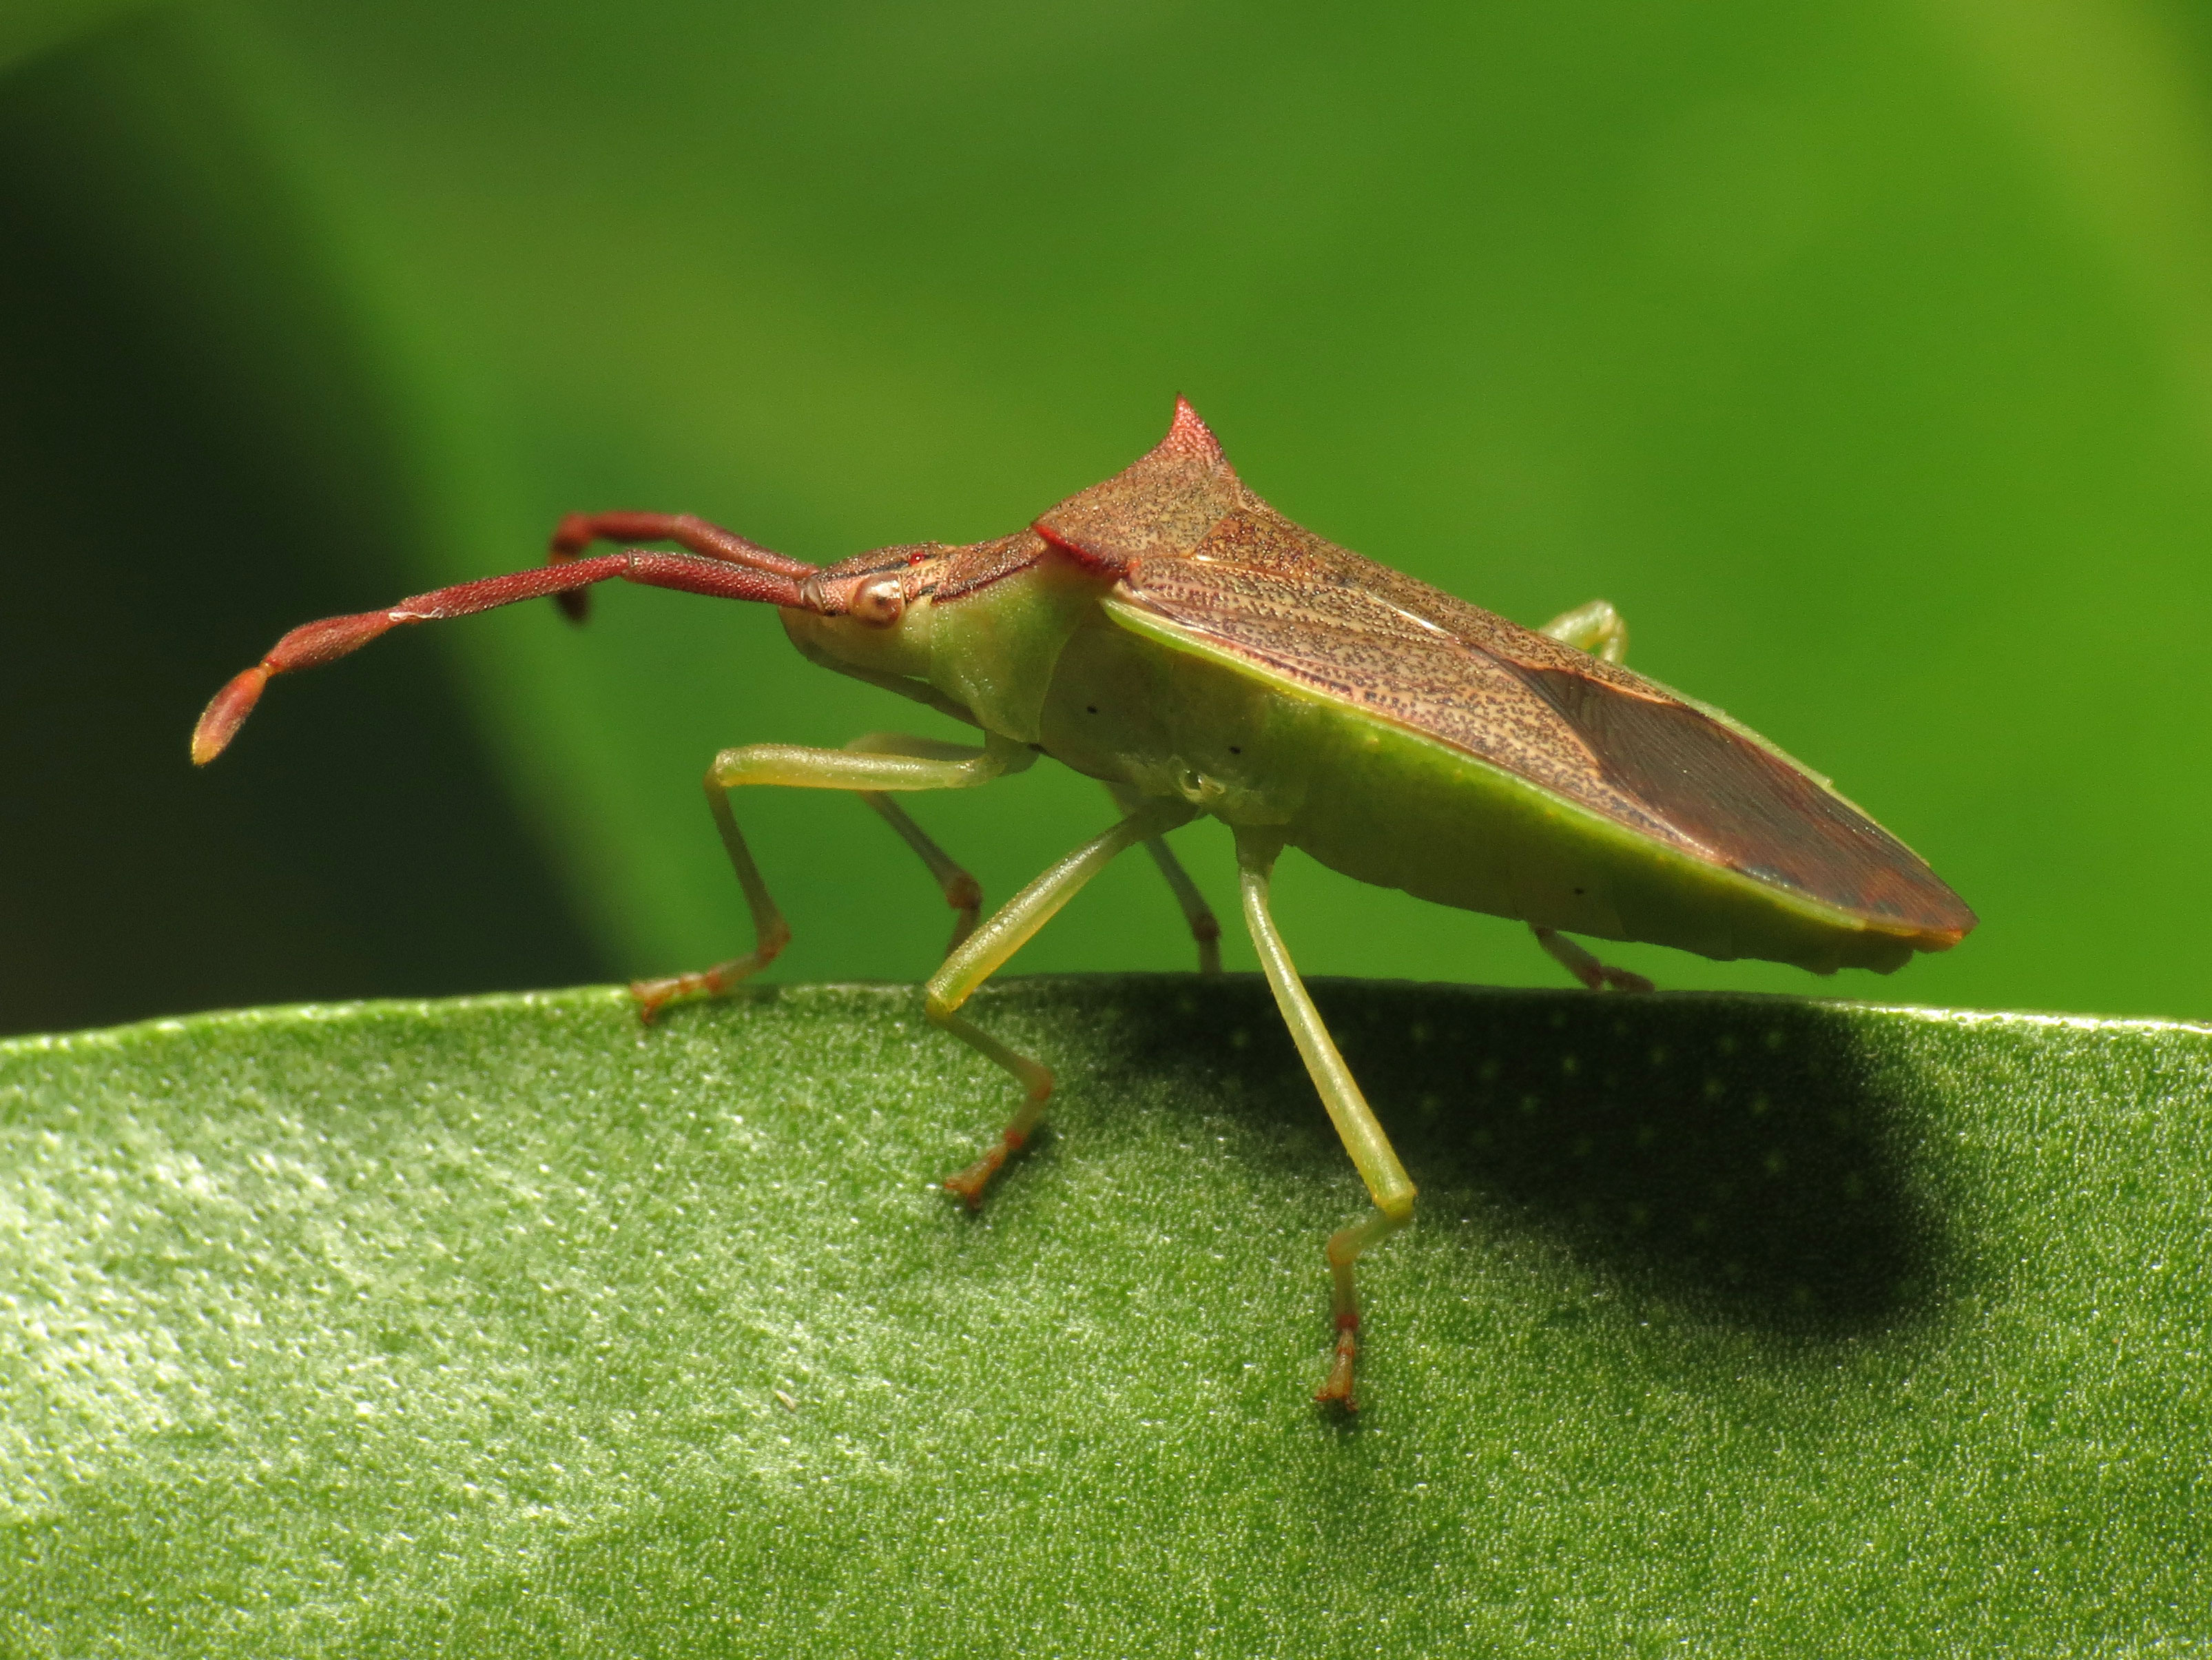 File:Leaf-footed Bug (16105784975).jpg - Wikimedia Commons